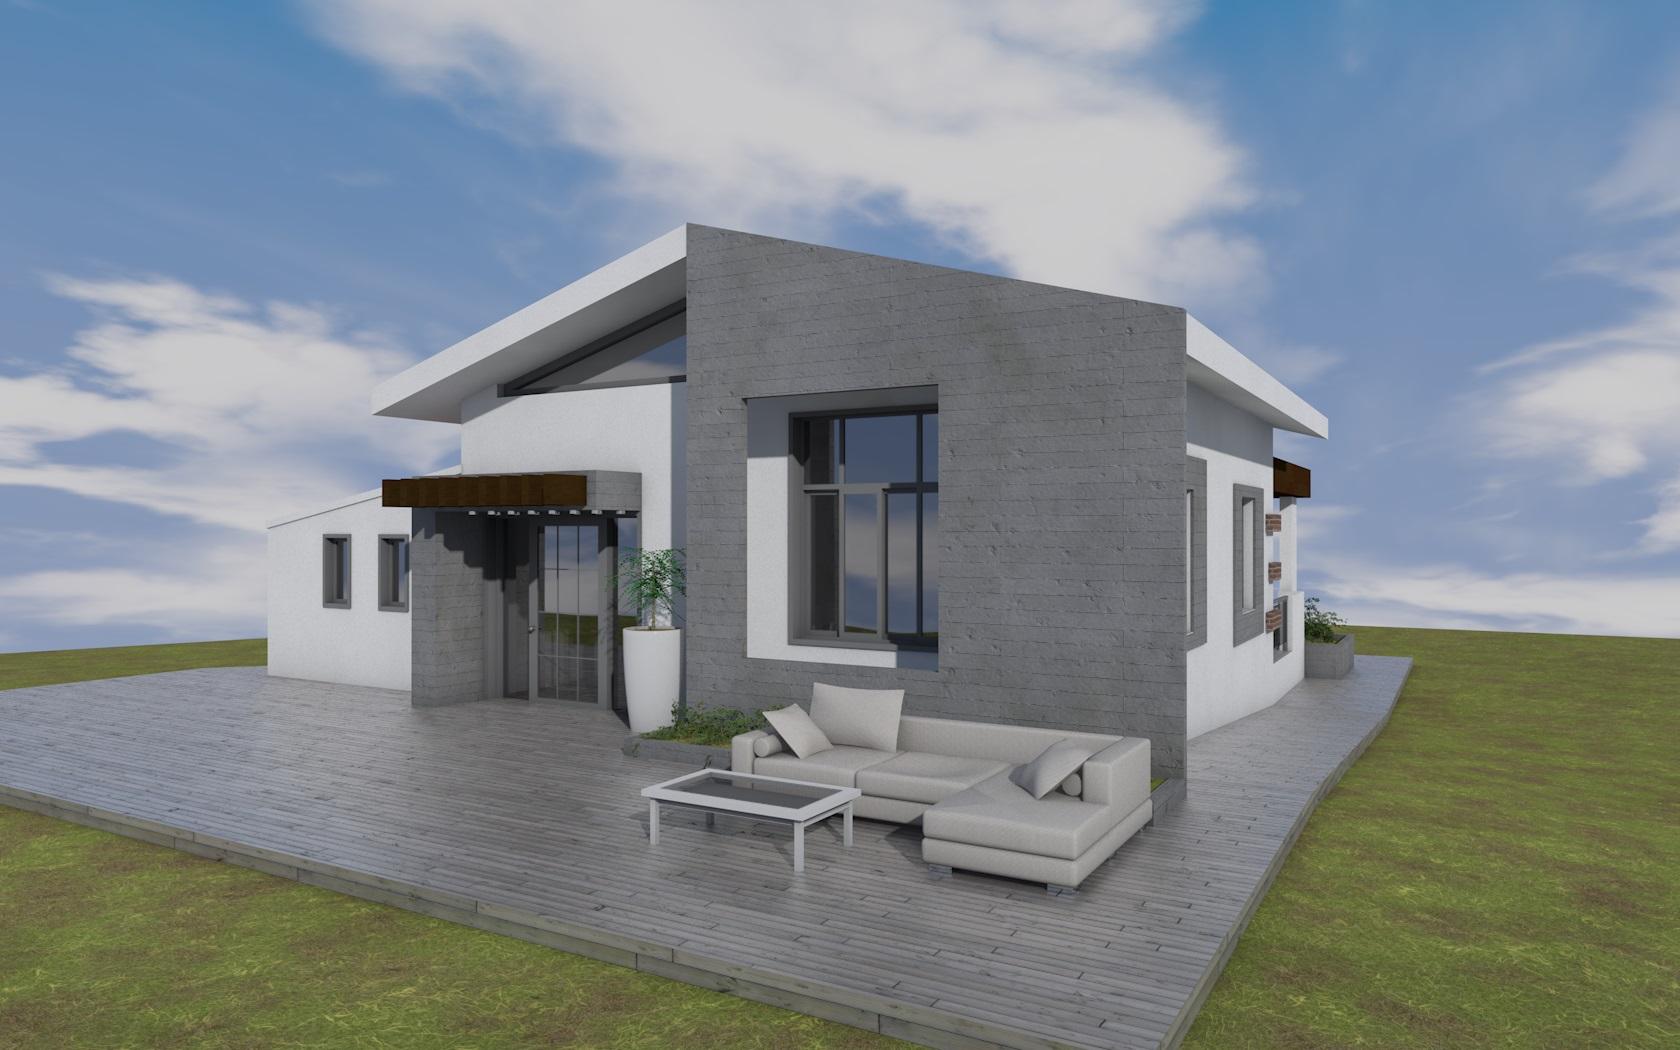 Lavori di ristrutturazione dei fabbricati da destinare a residence/casa vacanze (Bistrot)